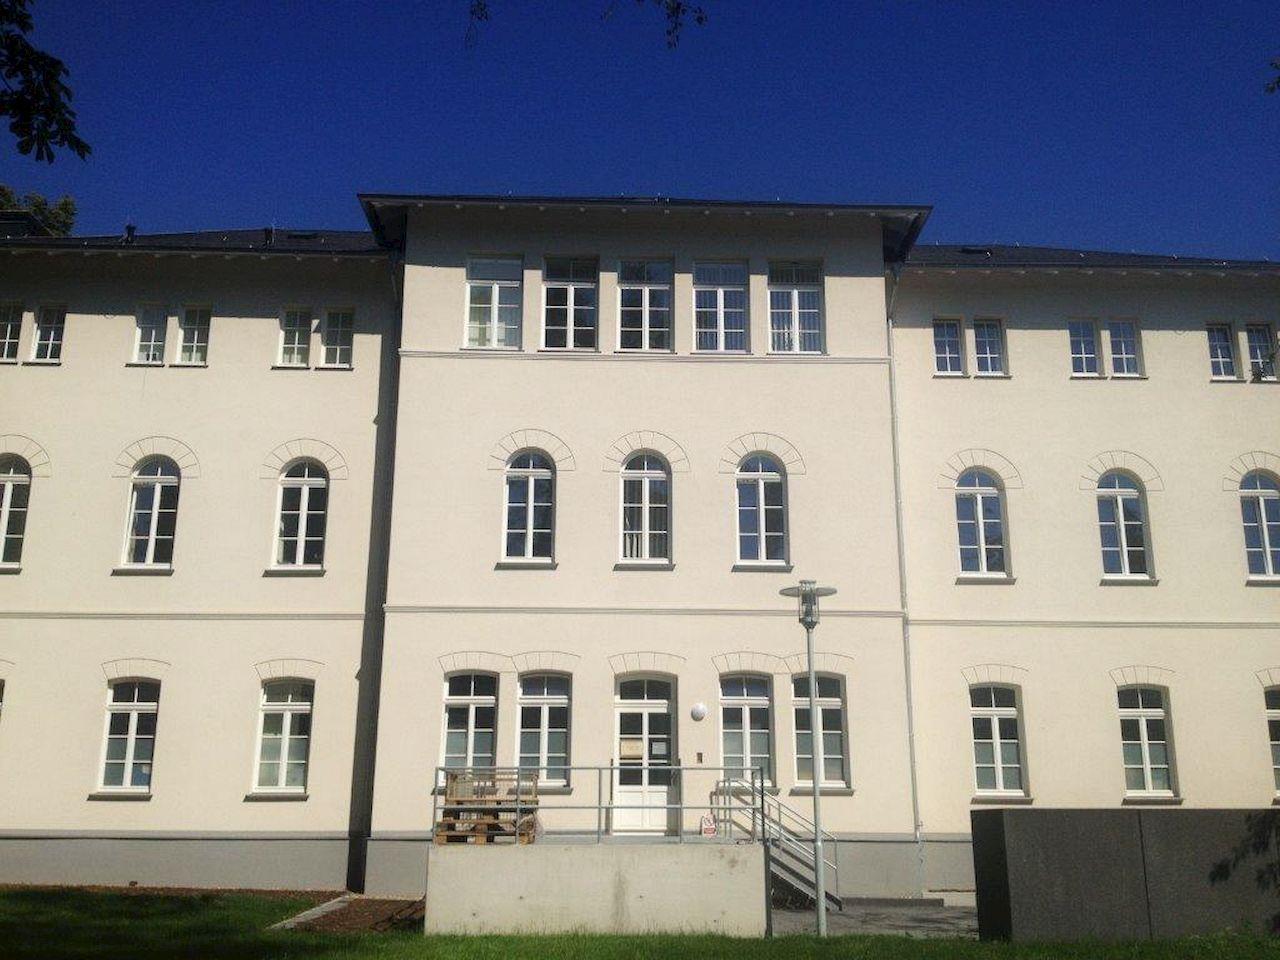 LVR-Duesseldorf-Fenster-Tueren_4